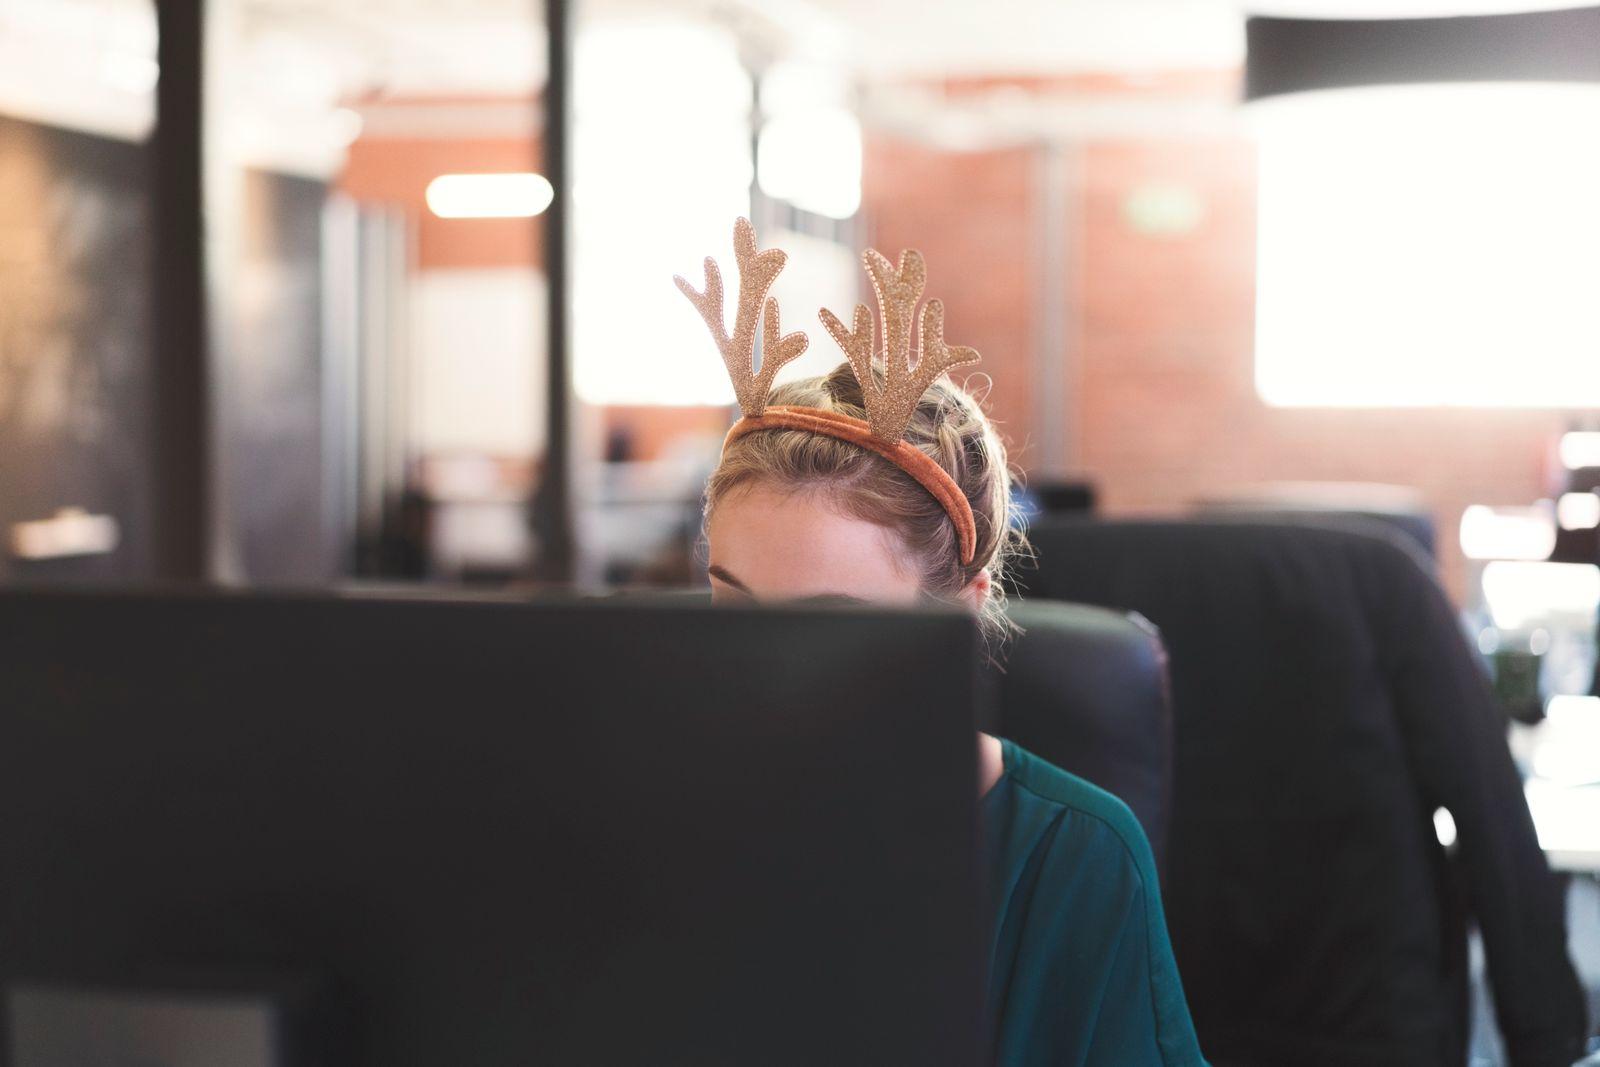 Businesswoman wearing reindeer antlers at office